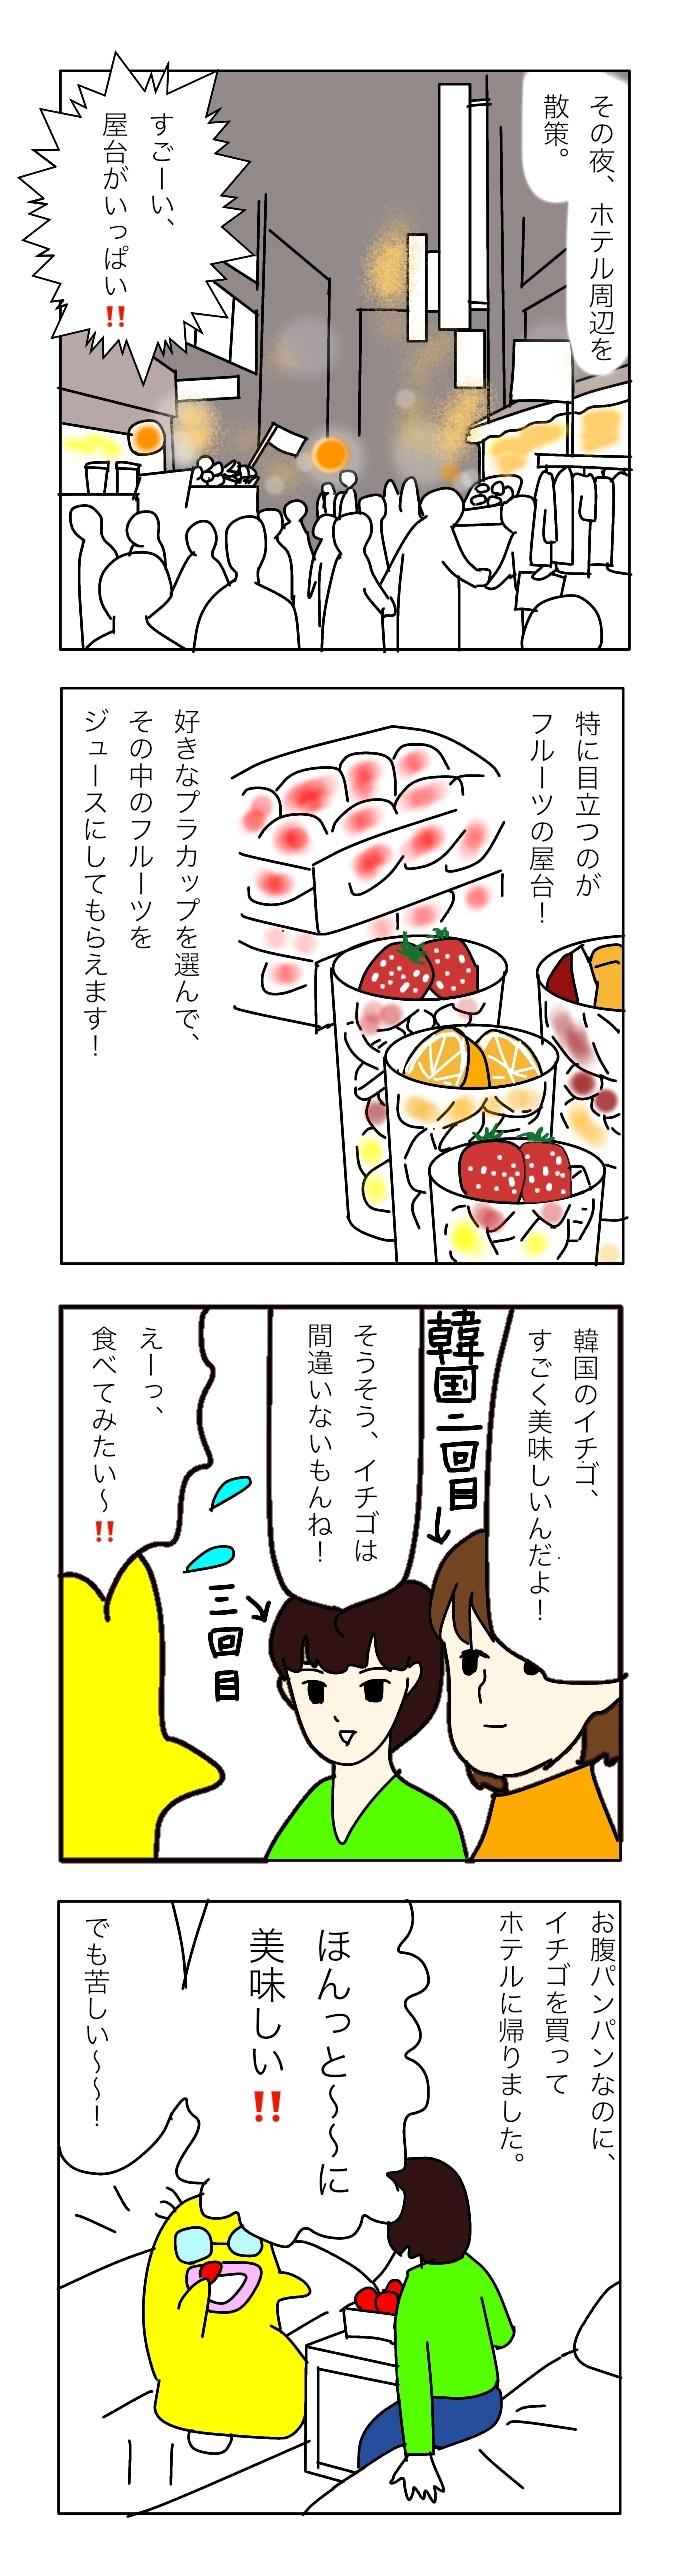 kankoku4 いちご